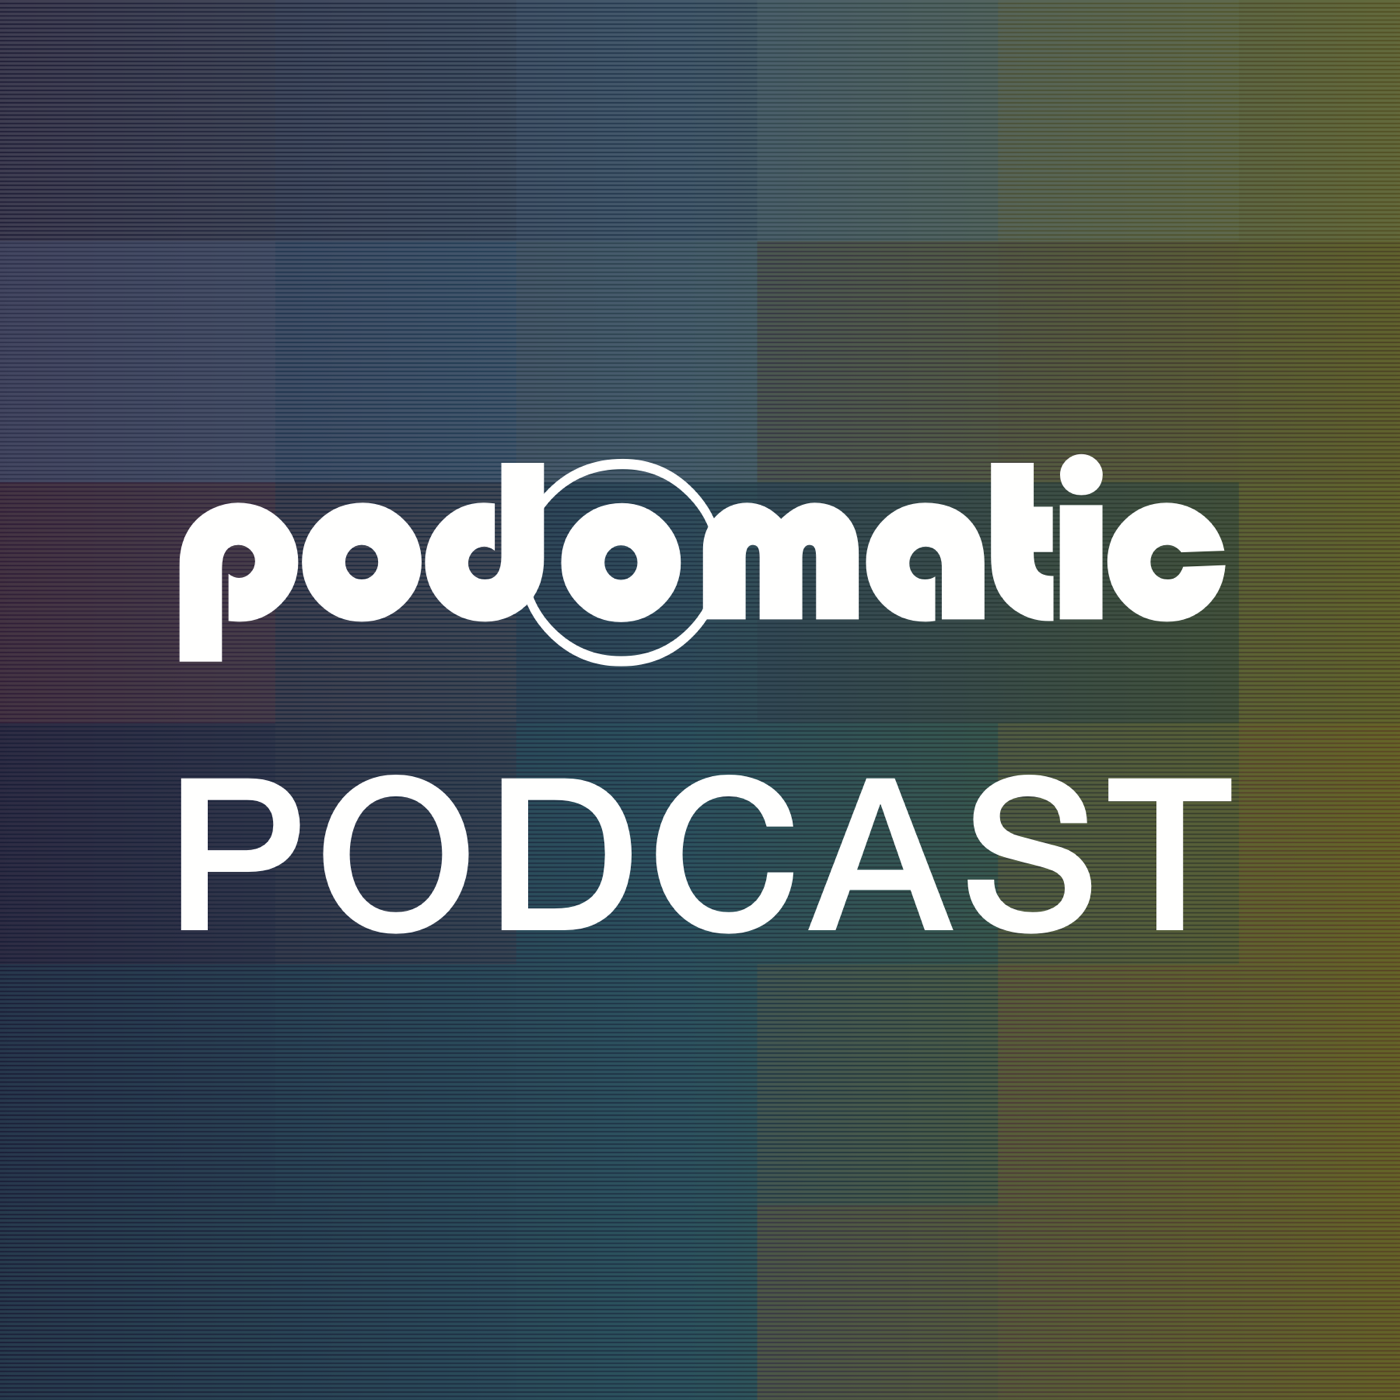 Logic Cast's Podcast